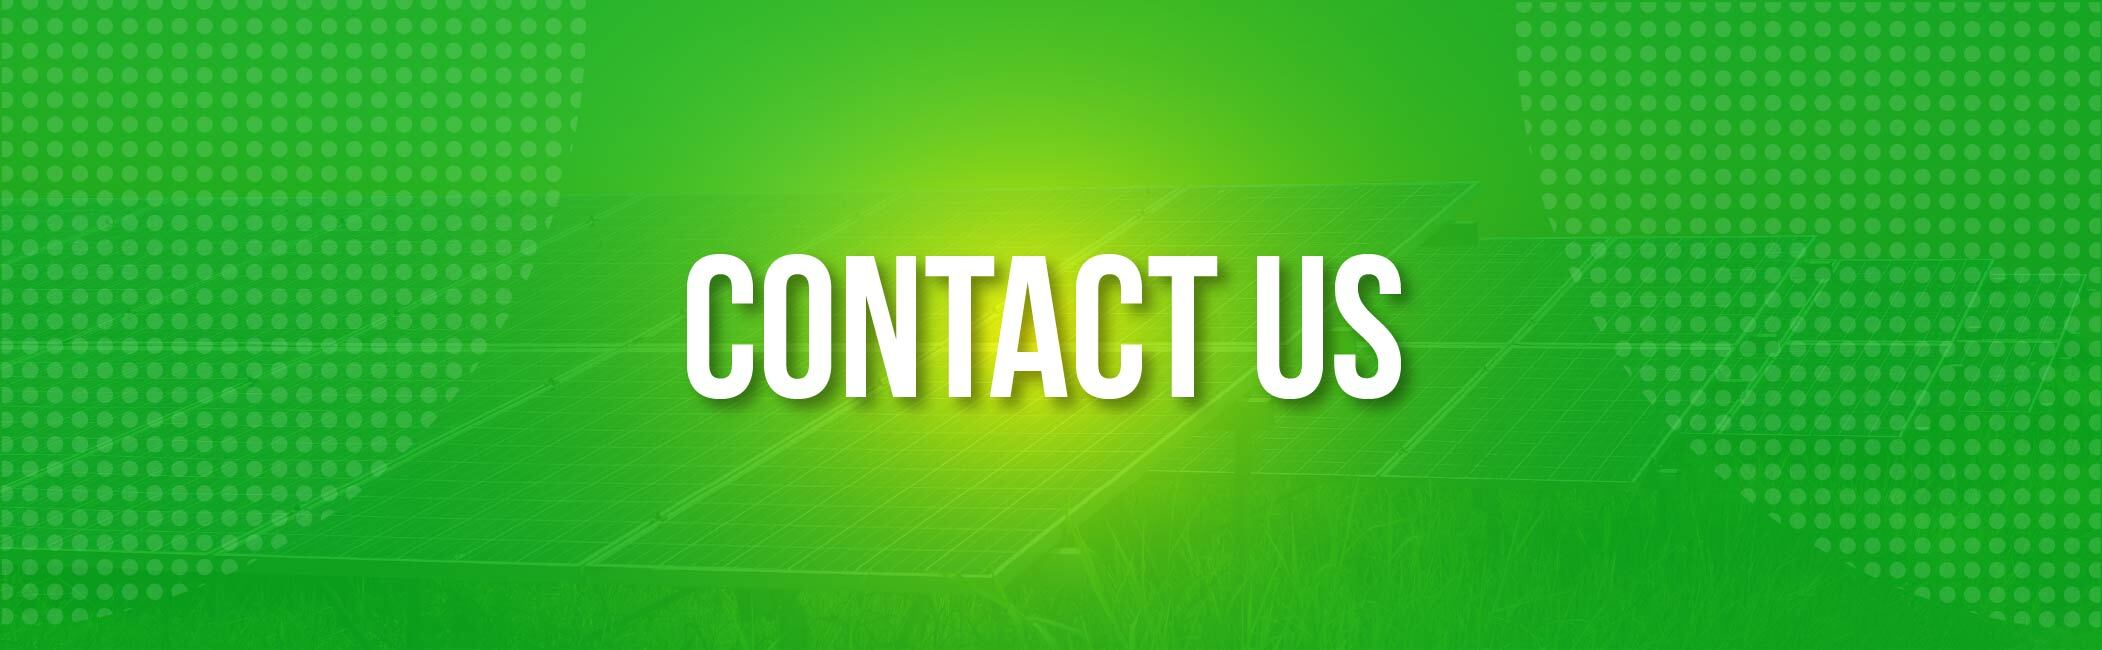 Inca - Contact us